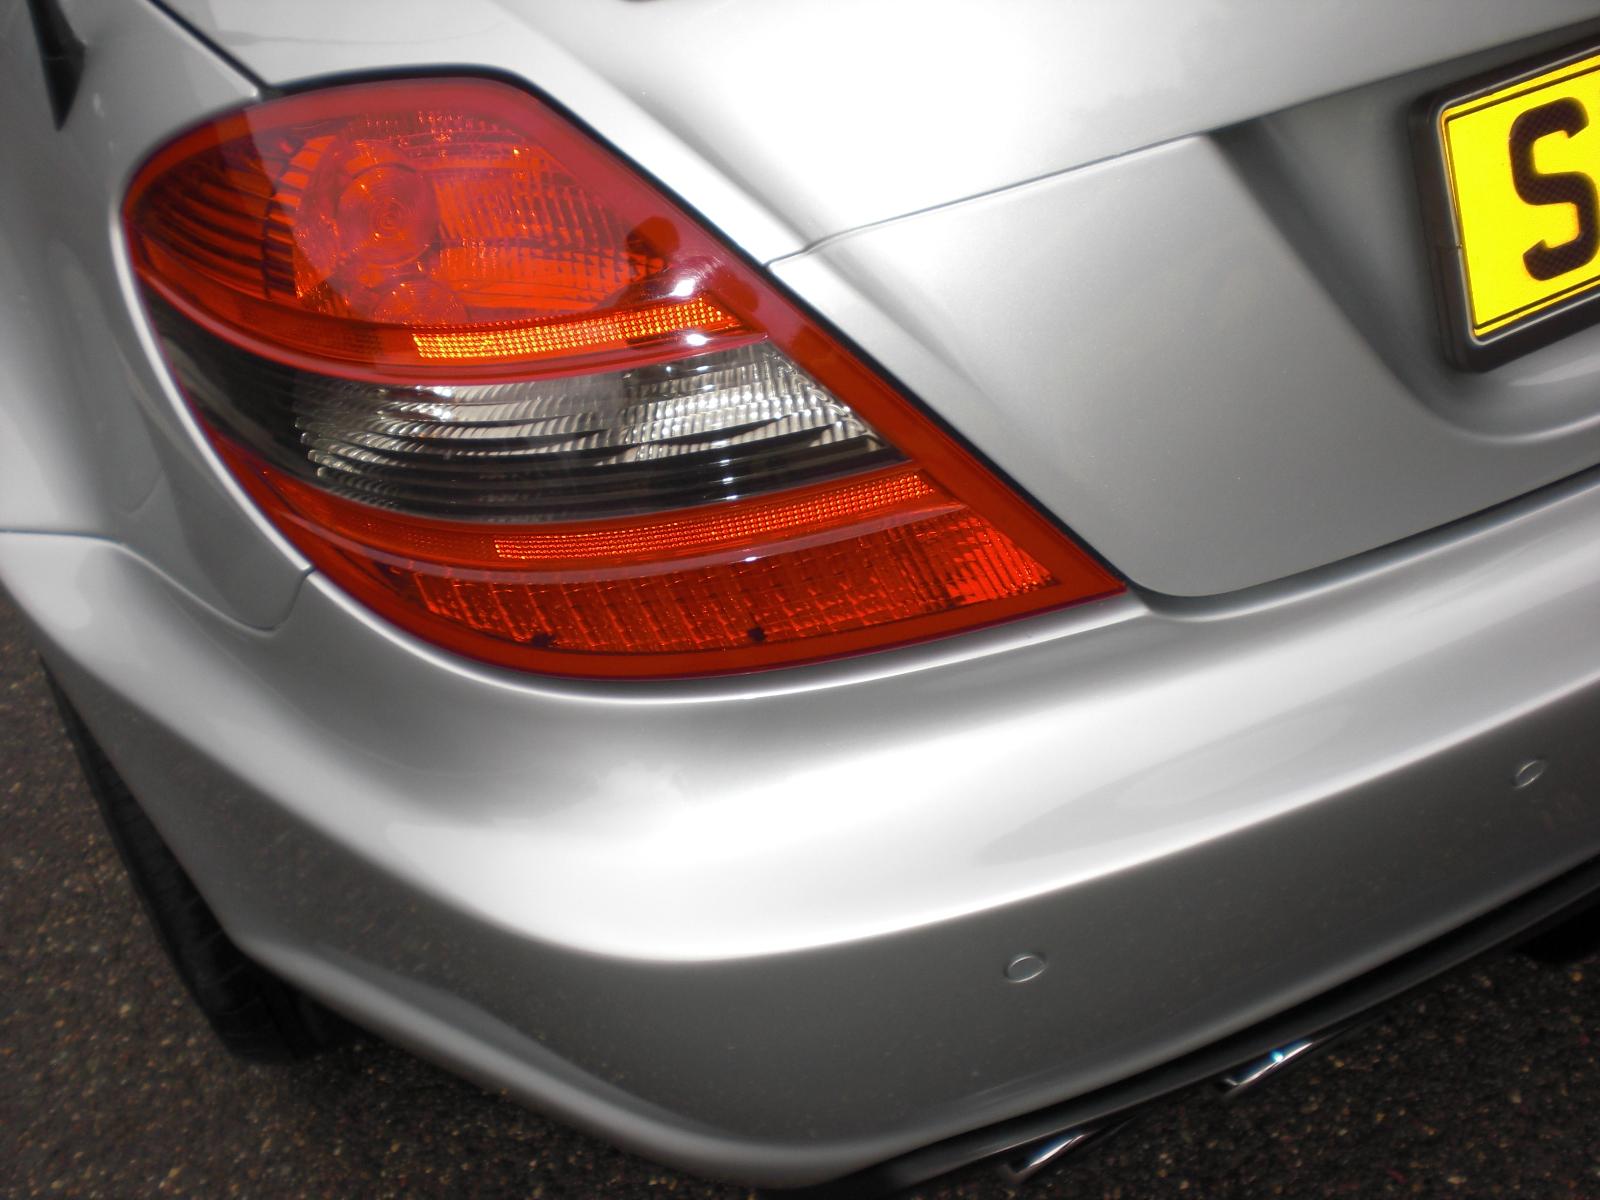 SLK R171 AMG Black Series bodykit Bausatz wide body Göckel Automobilveredelung Styling Tuning Mercedes Benz